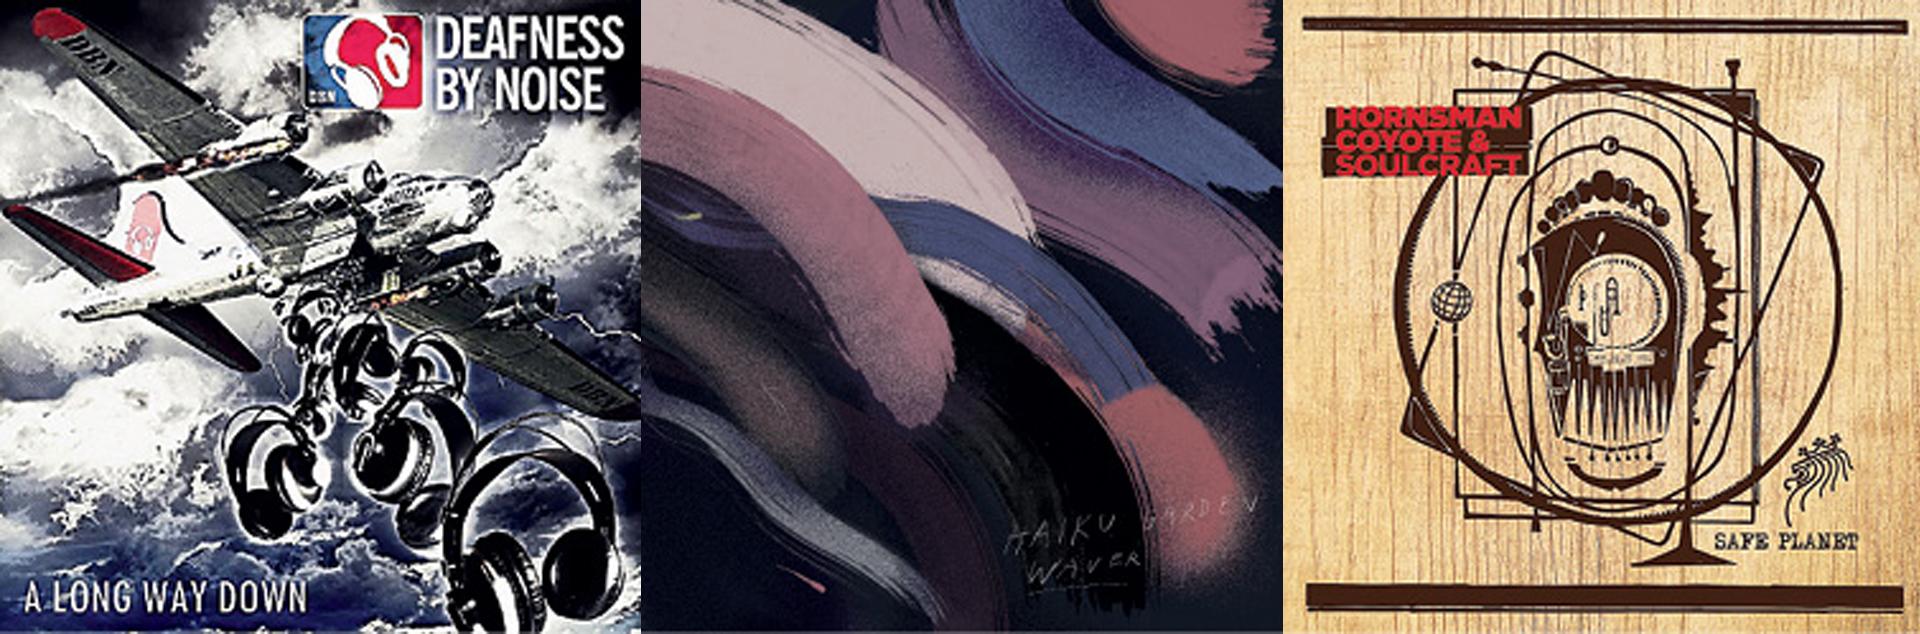 GLAZBENE RECENZIJE Deafness by Noise, Haiku Garden, Hornsman Coyote & Soulcraft